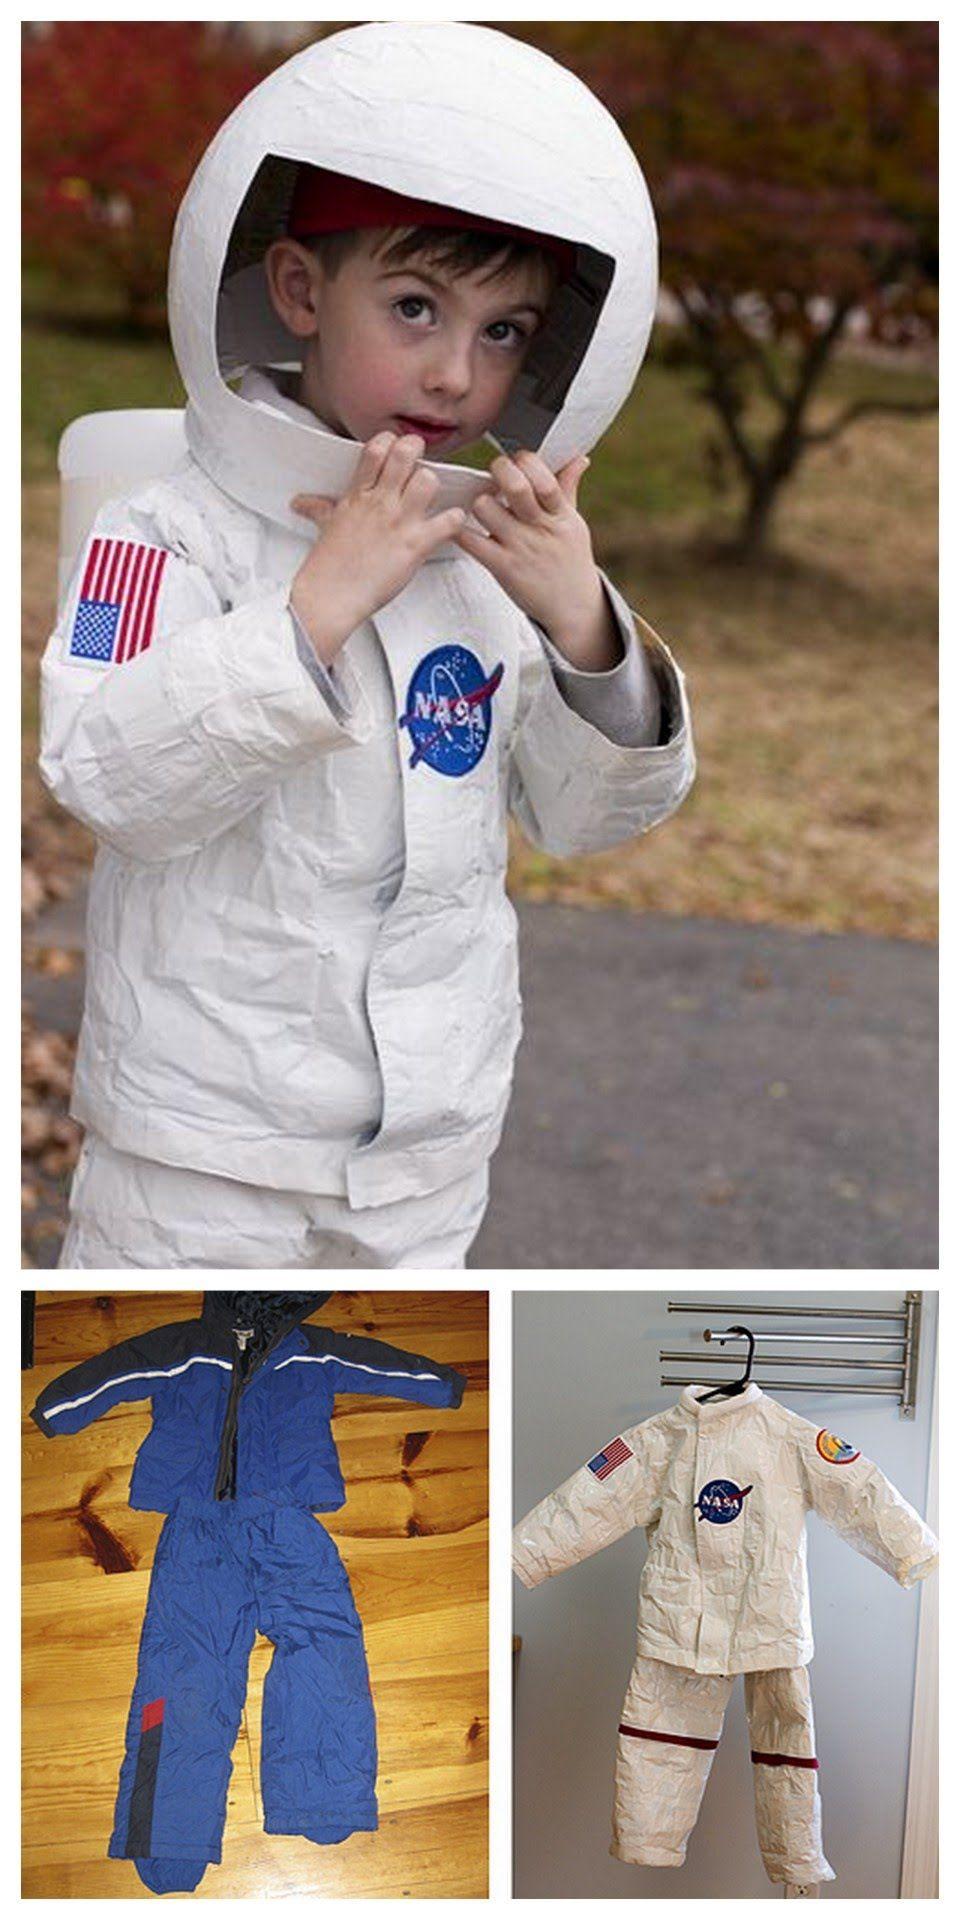 truebluemeandyou Halloween u0026 Cosplay DIYs u2014 DIY Astronaut Costume Tutorial from.  sc 1 st  Pinterest & truebluemeandyou: Halloween u0026 Cosplay DIYs u2014 DIY Astronaut Costume ...